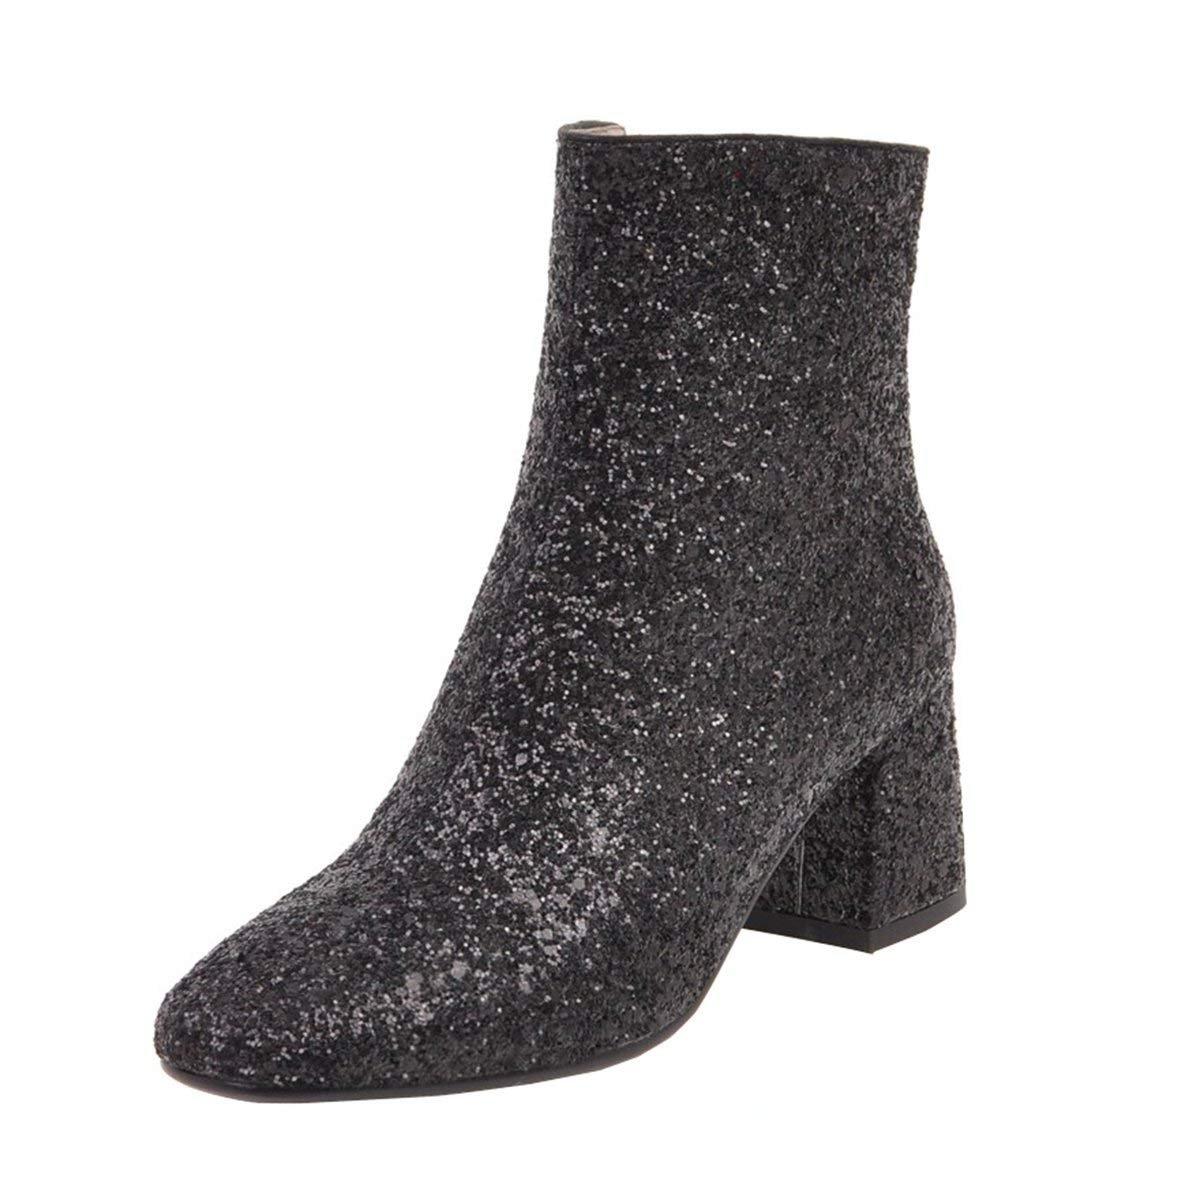 YE Chaussure Elegante Ankle Botte Boots Bottine Mariage Paillette Femme Bout Pointu Mi Talon Bloc Chunky Heels Zip Courte Hiver